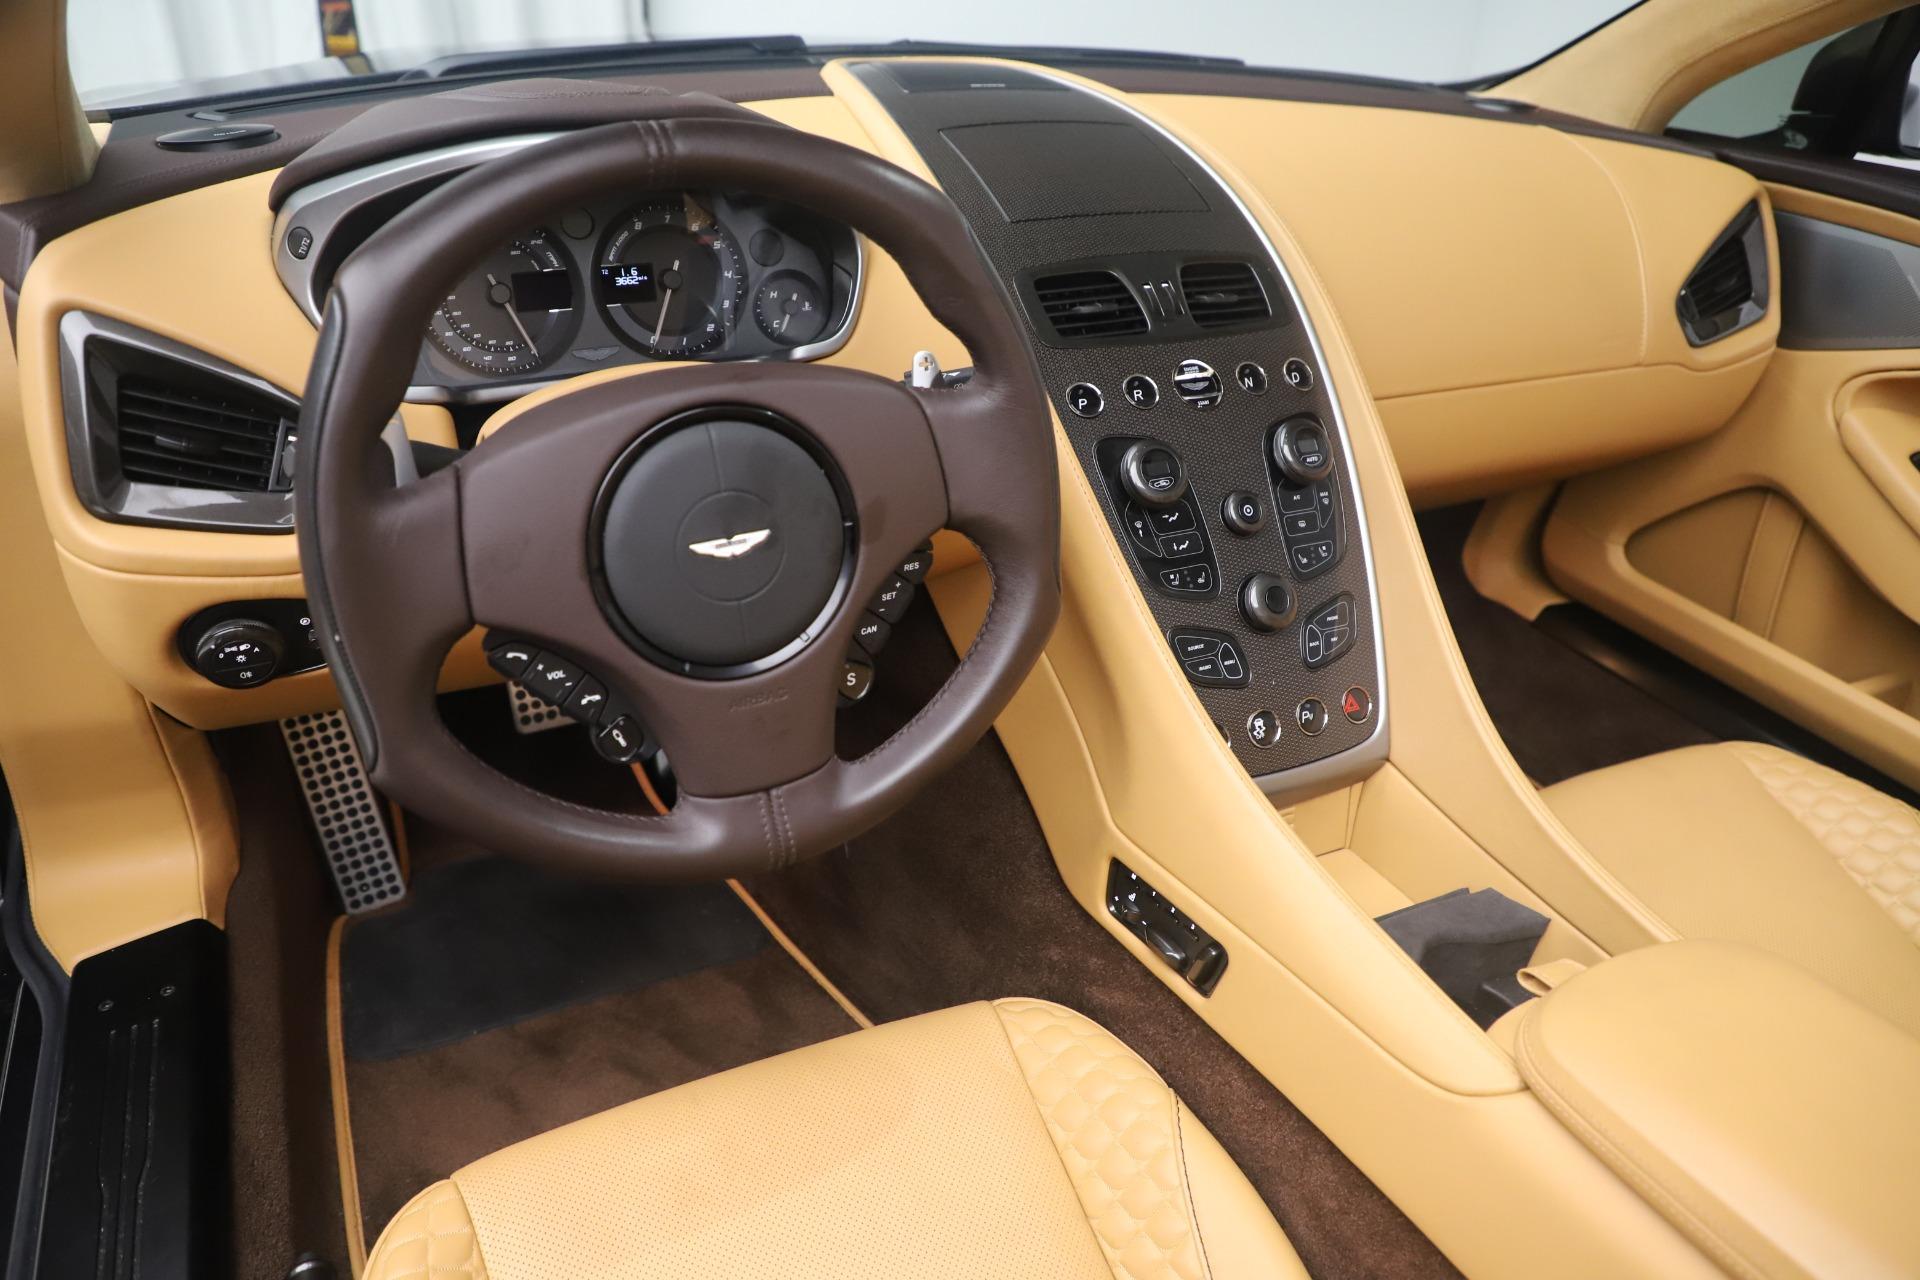 Used 2016 Aston Martin Vanquish Volante For Sale In Greenwich, CT 3542_p21